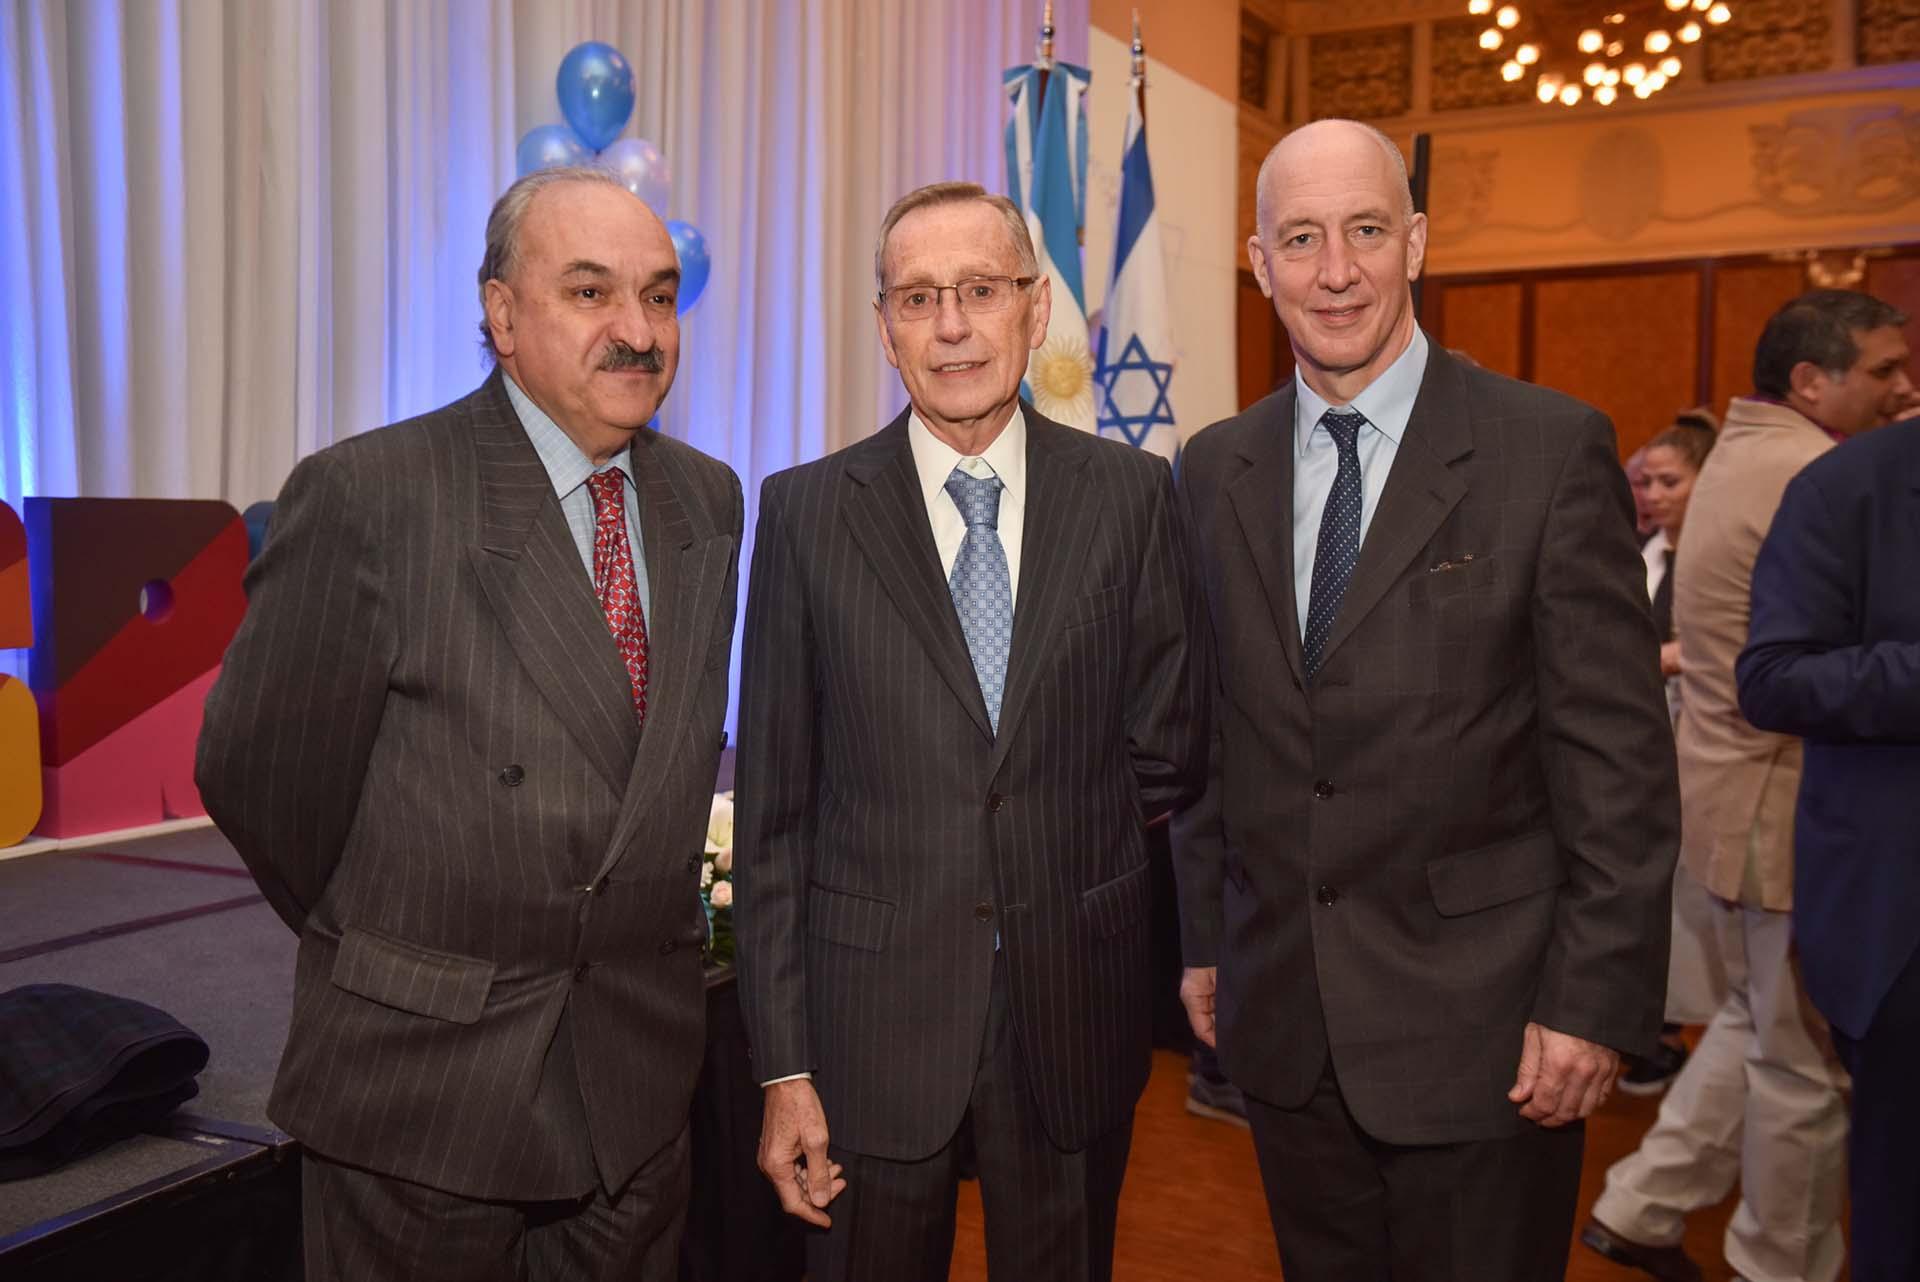 Pedro Villagra, Adalberto Rodríguez Giavarini y Mark Kent, embajador del Reino Unido